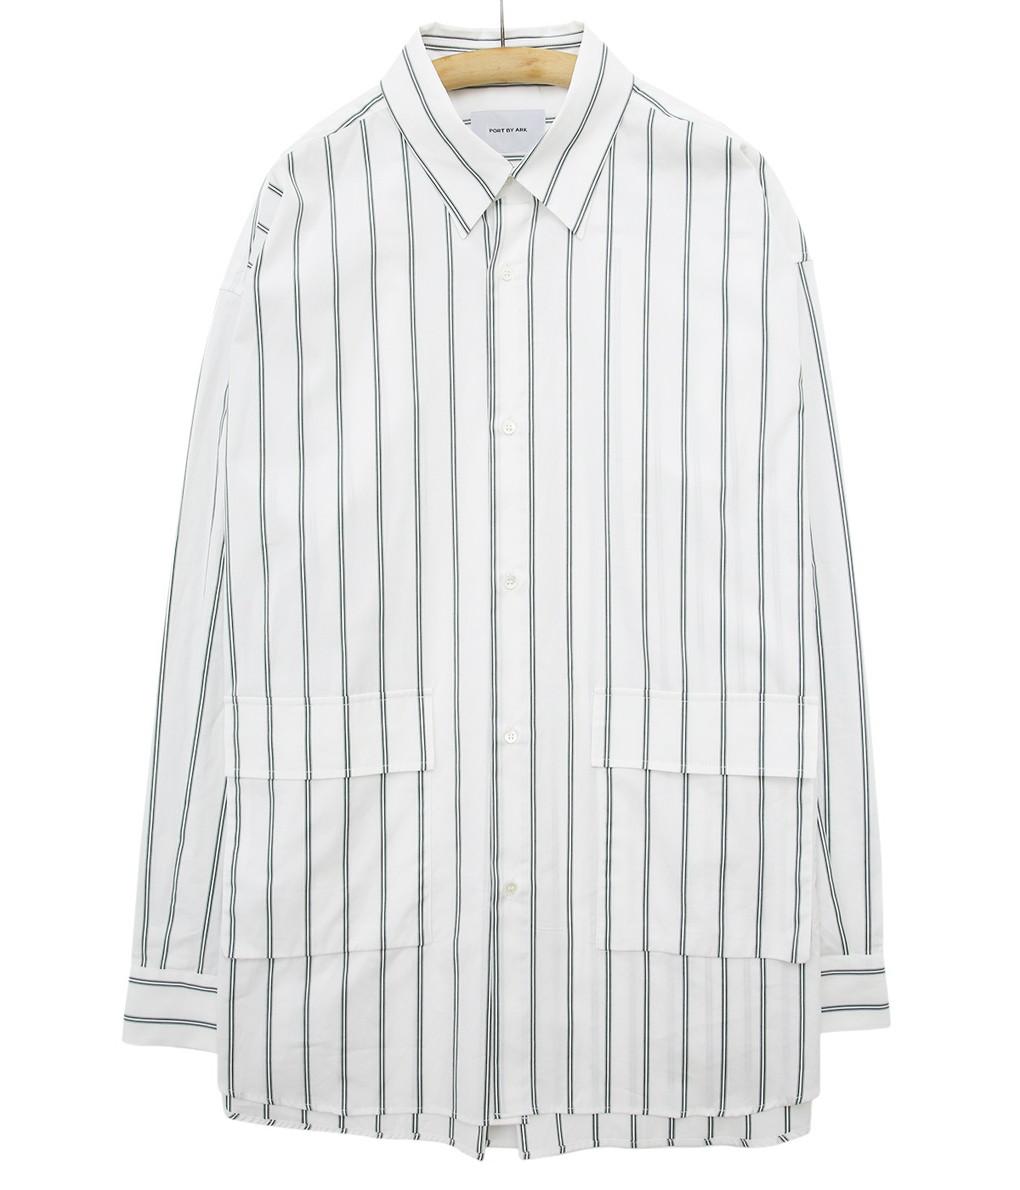 PORT BY ARK / ポートバイアーク : W pocket shirts : ポートバイアーク ダブルポケットシャツ ポケットシャツ シャツ ロングスリーブシャツ / 全2色 : PO05-SH001 【COR】【BJB】